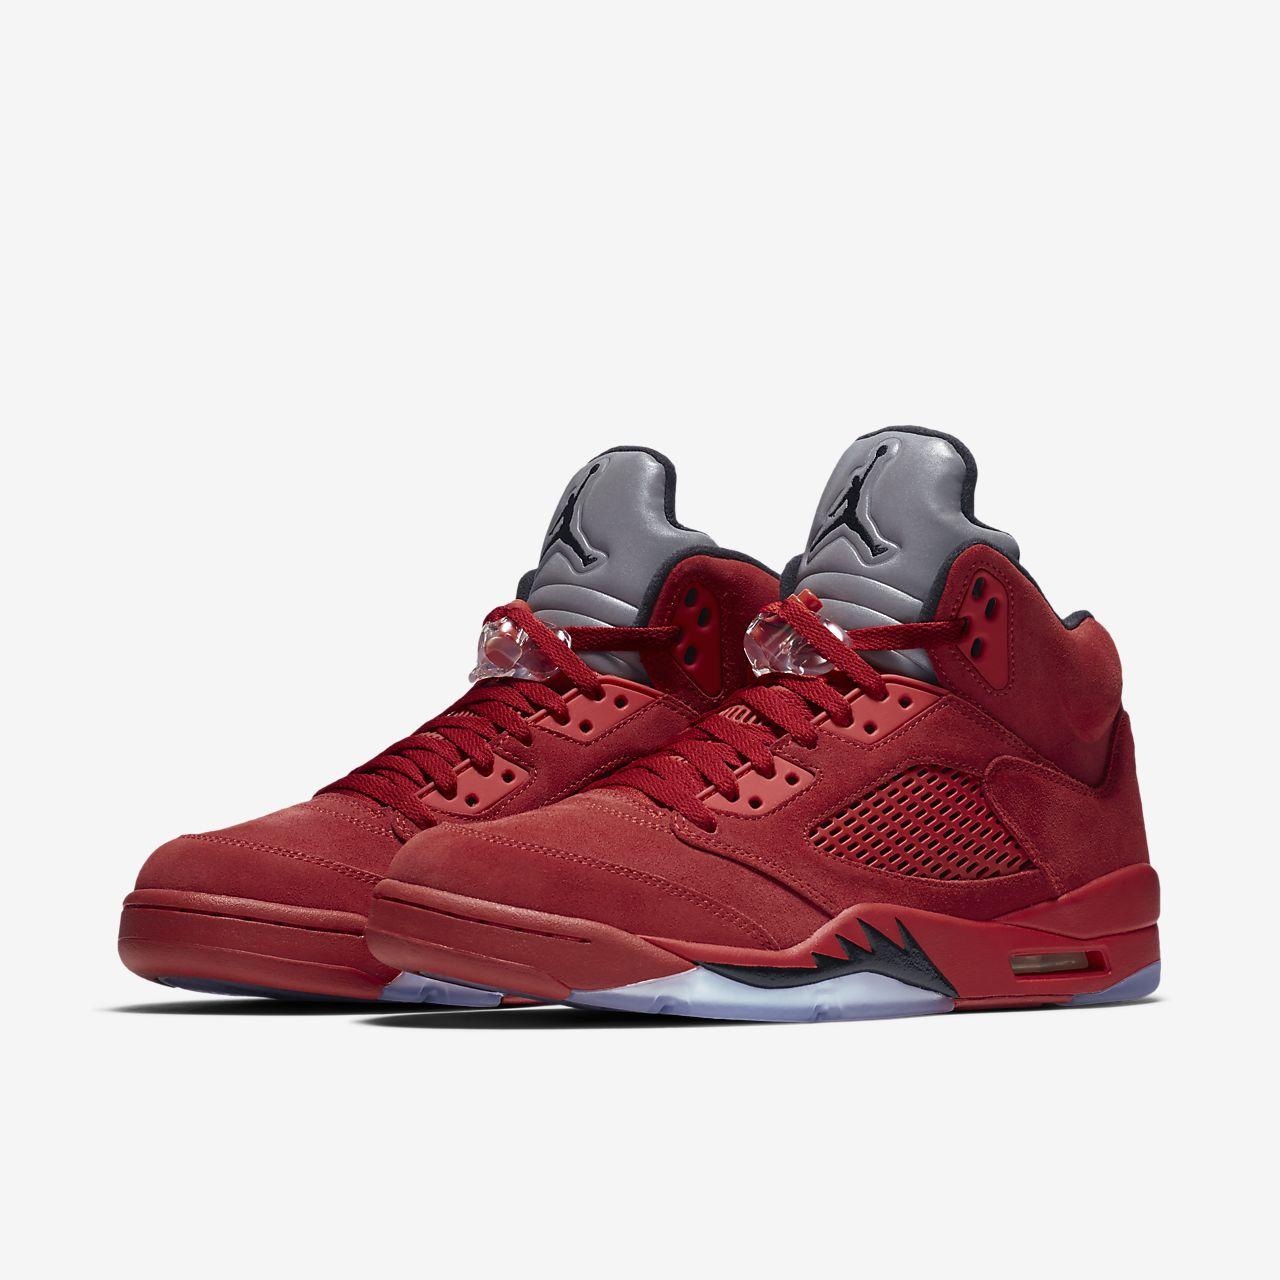 Jordan Nike Air Magasin Singapour